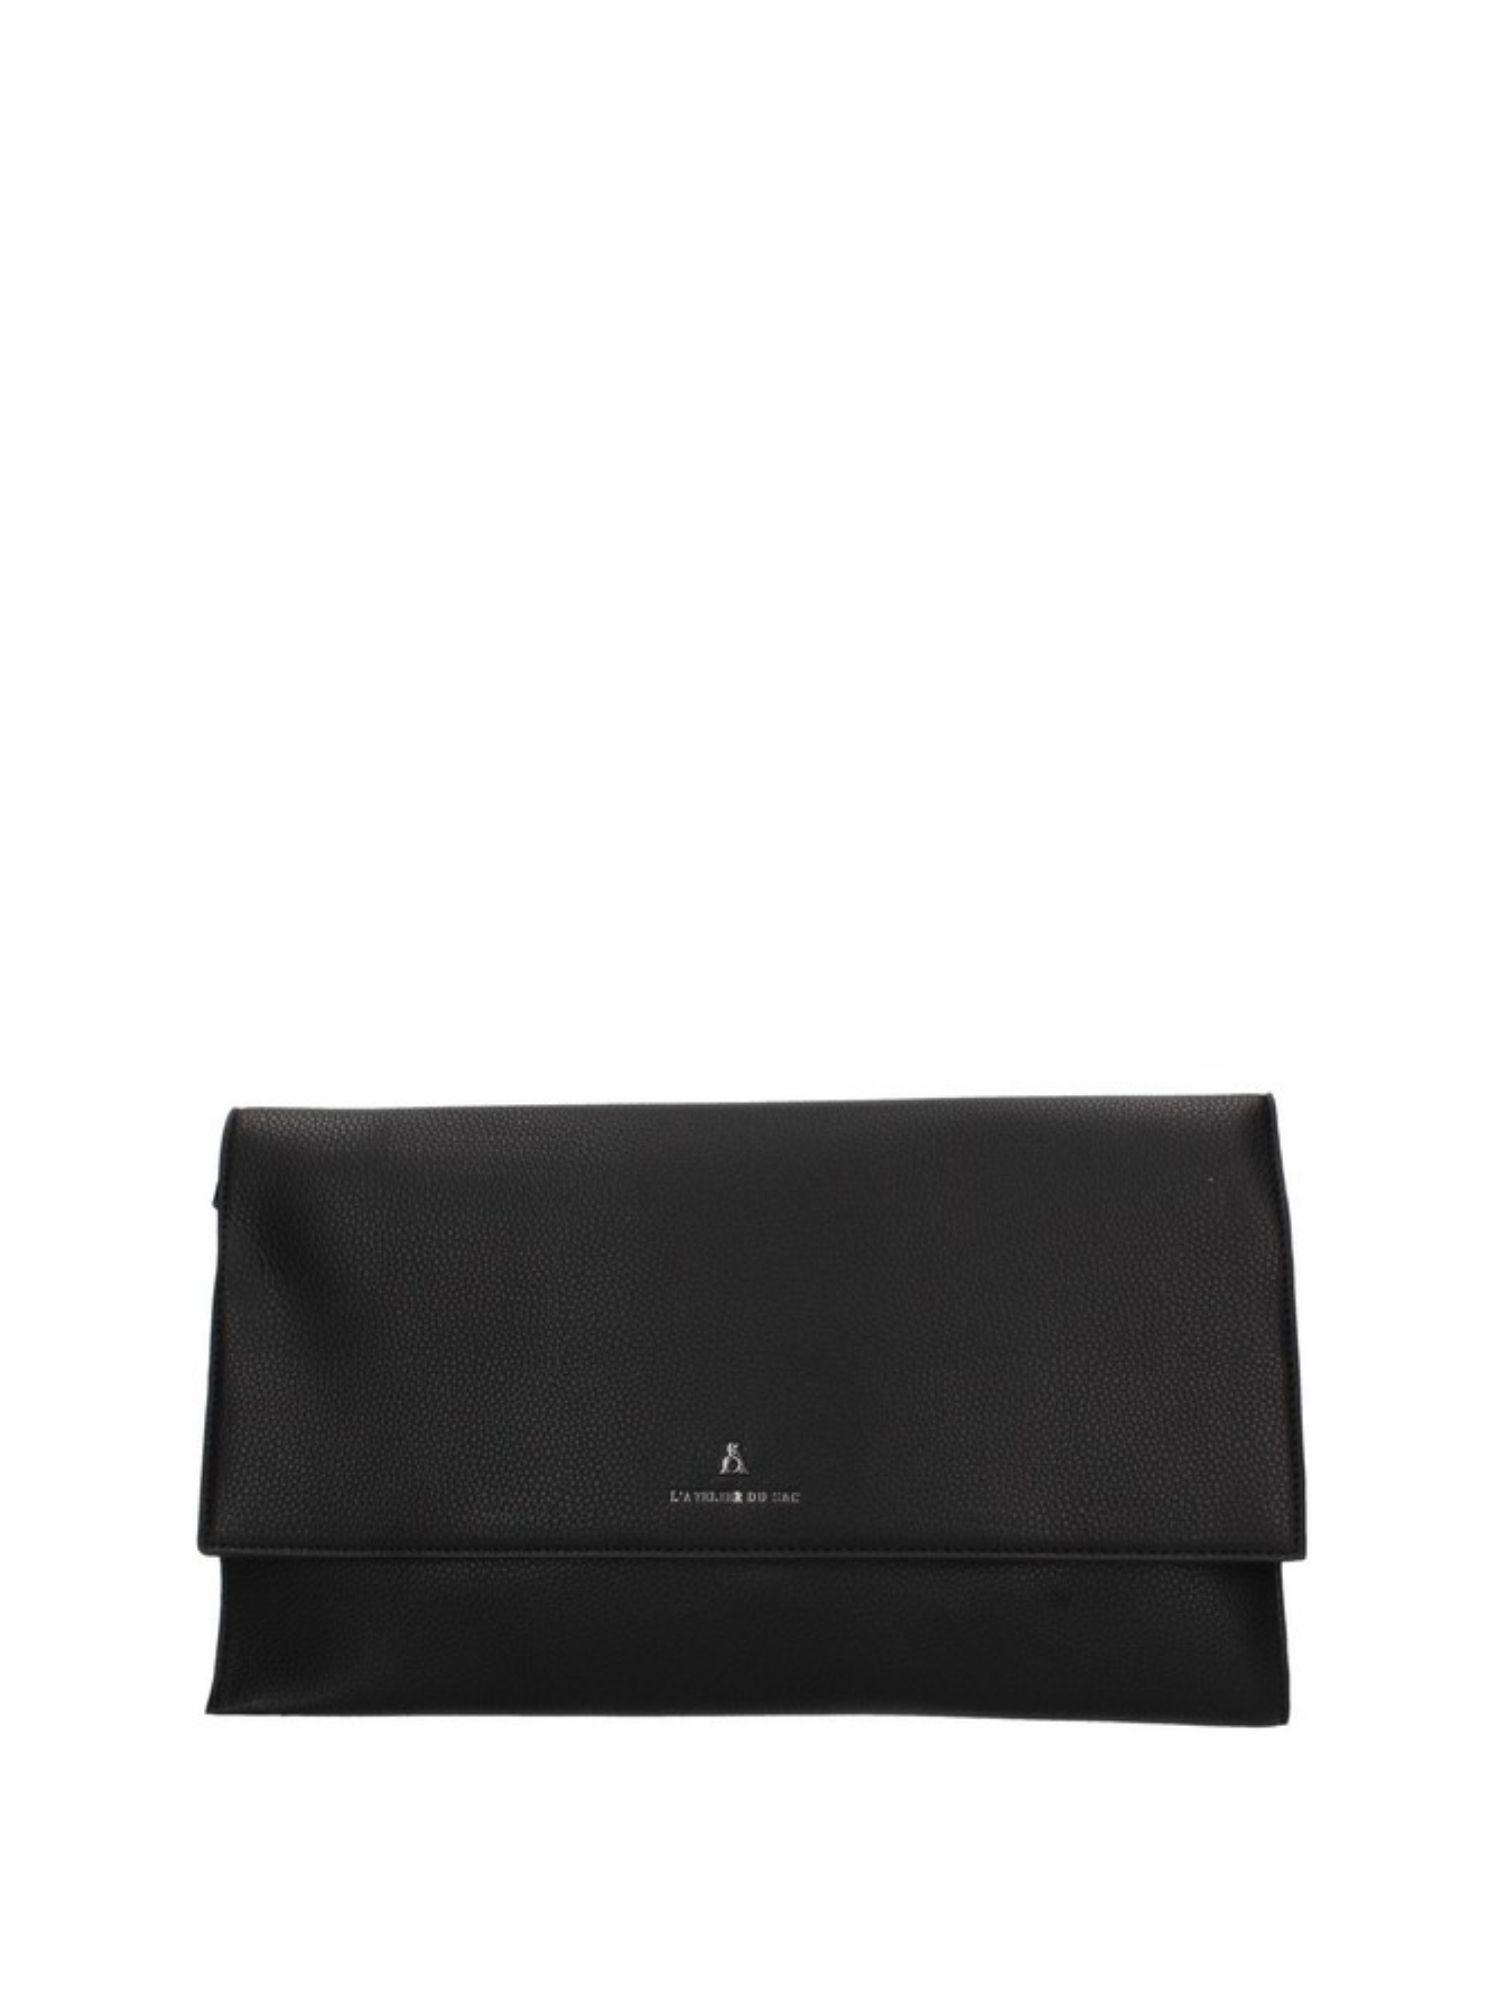 Borsa Clutch Atelier Du Sac Pash Bag 10807 Nero